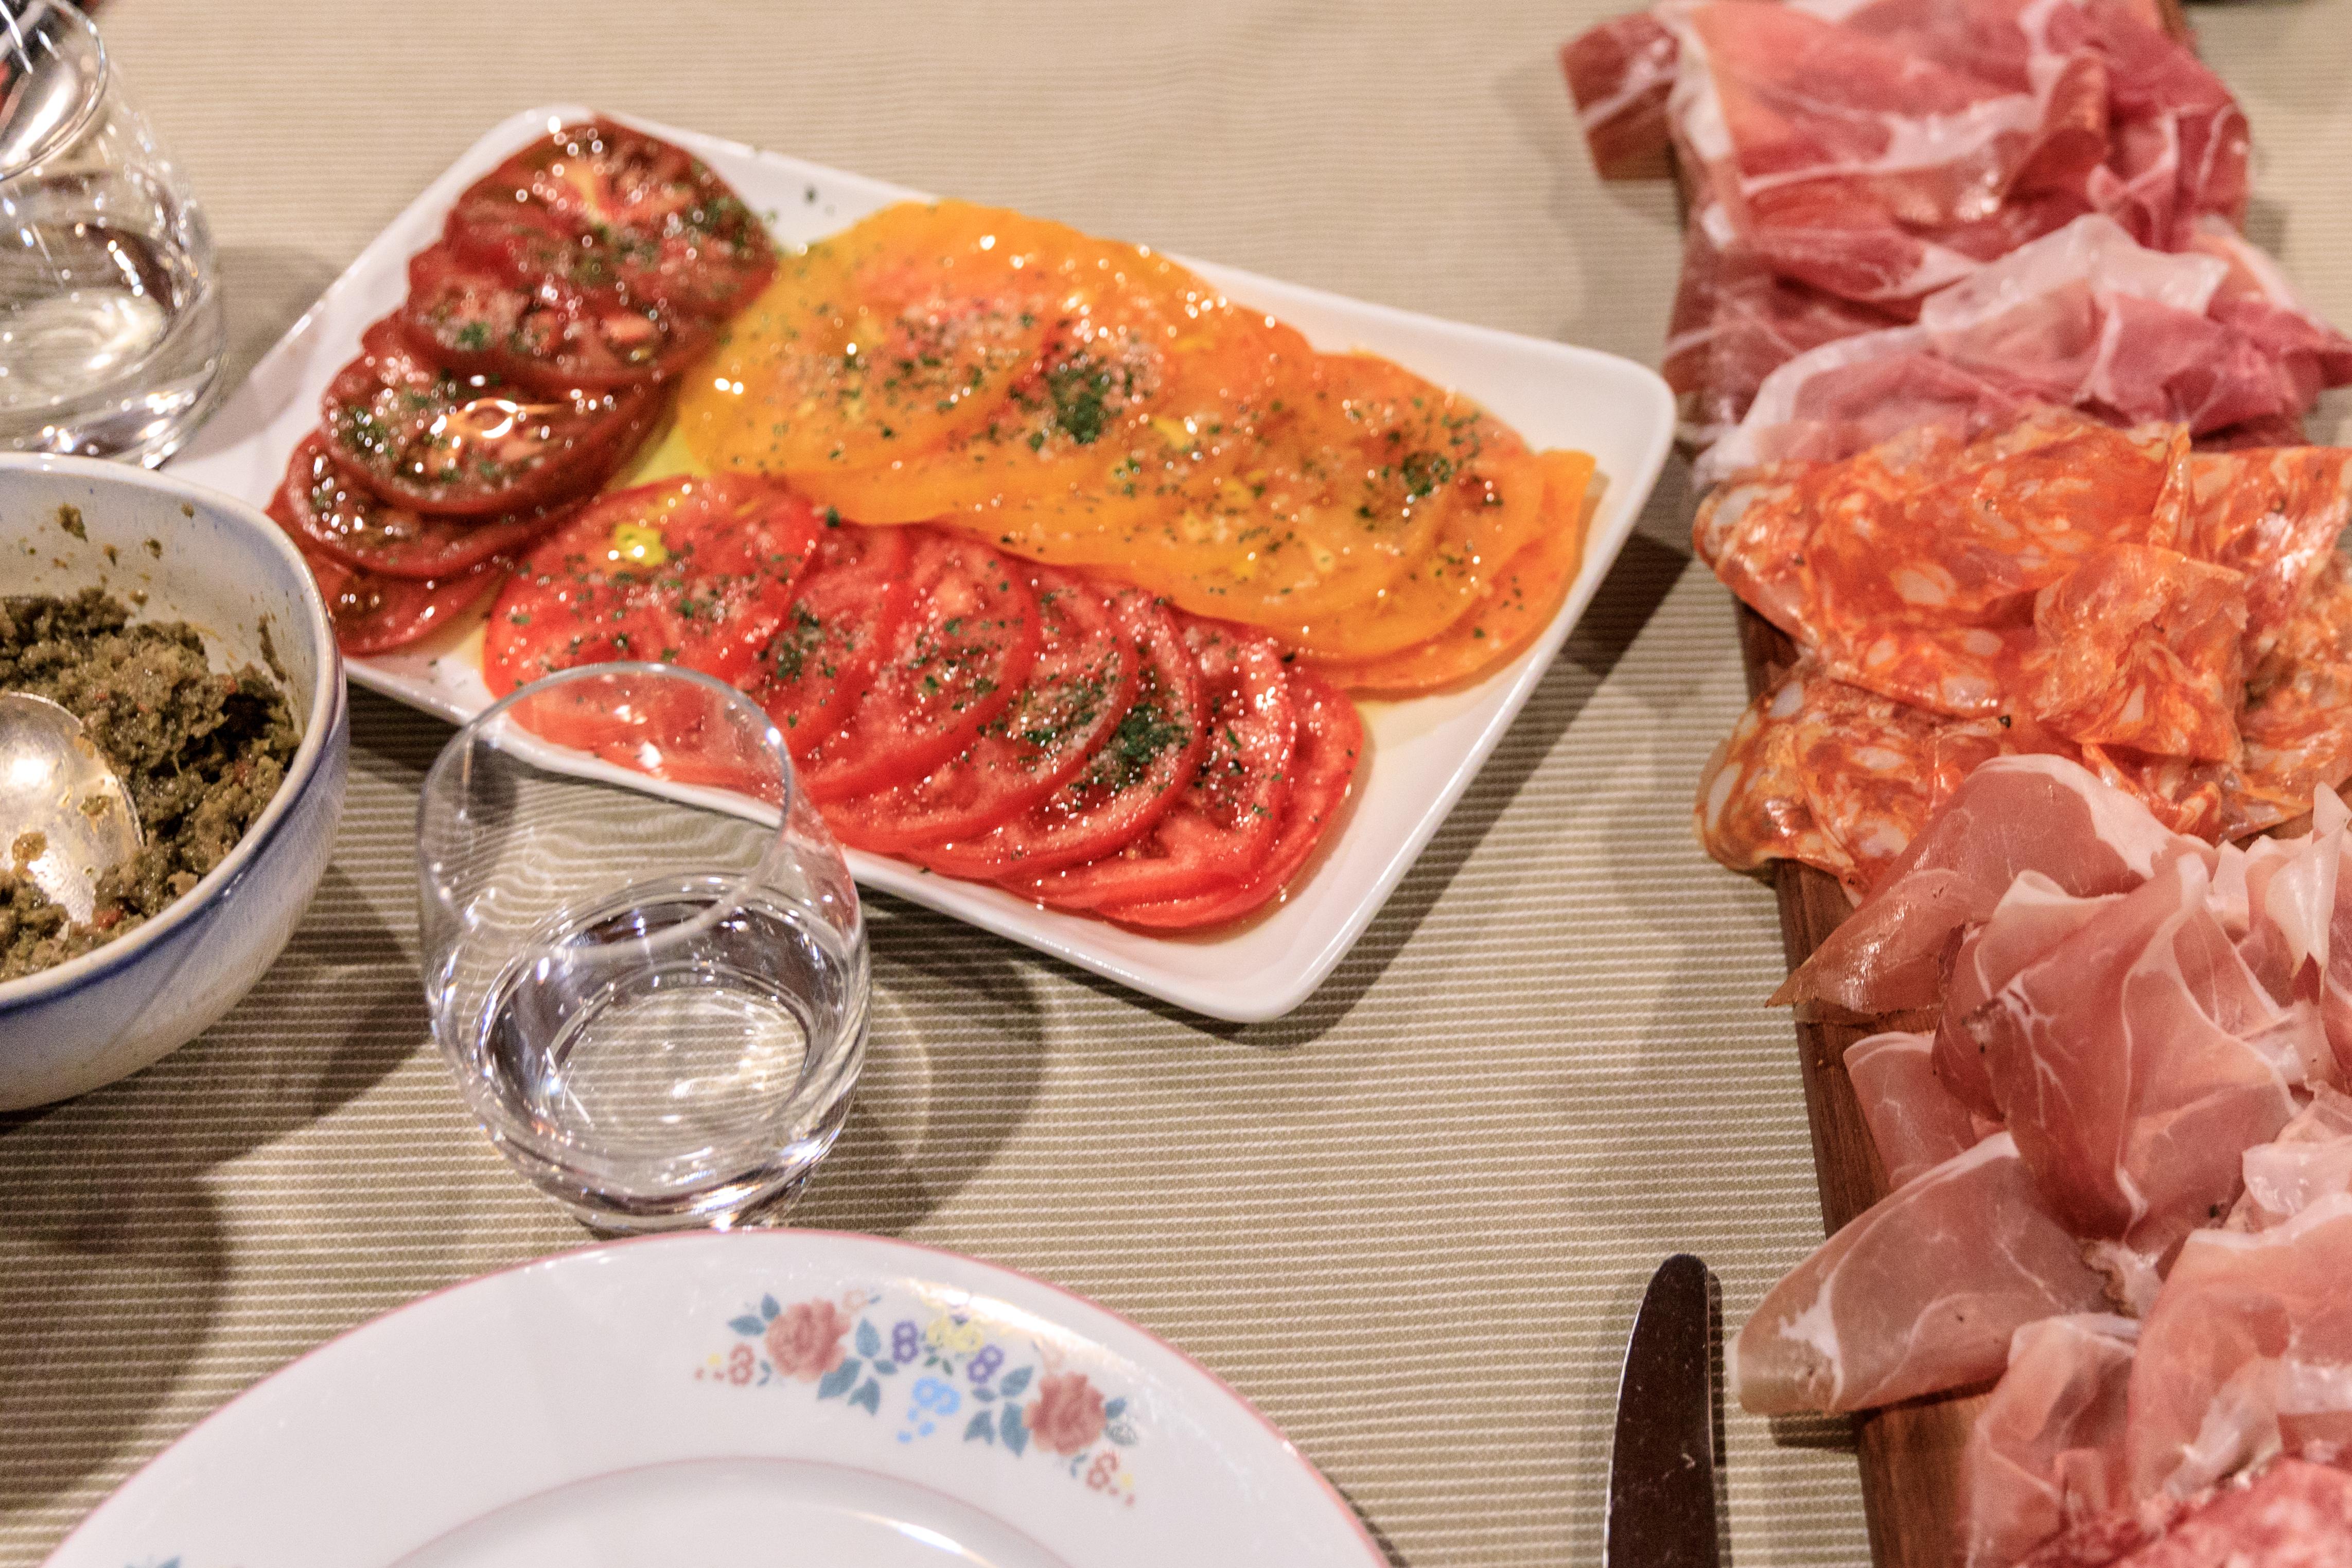 La-Chaumiere-Restaurant-Nice-Monaco-France-starters-food-menu